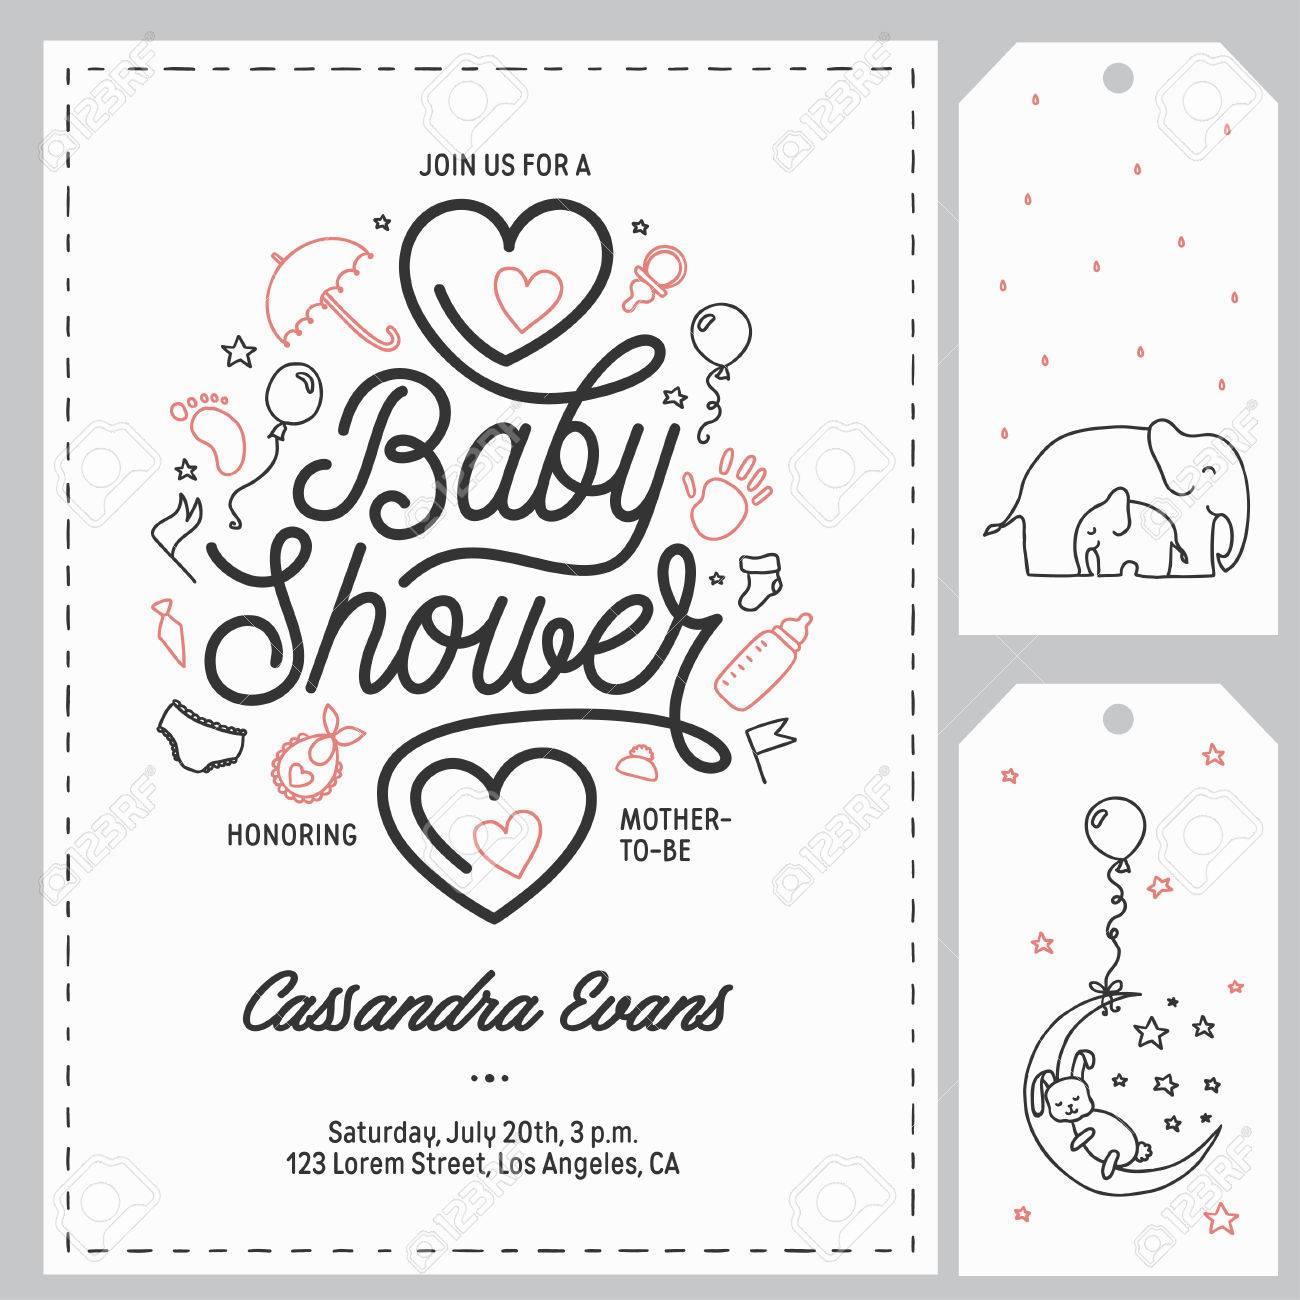 Baby shower invitation templates set hand drawn vintage baby shower invitation templates set hand drawn vintage illustration stock vector 77706173 filmwisefo